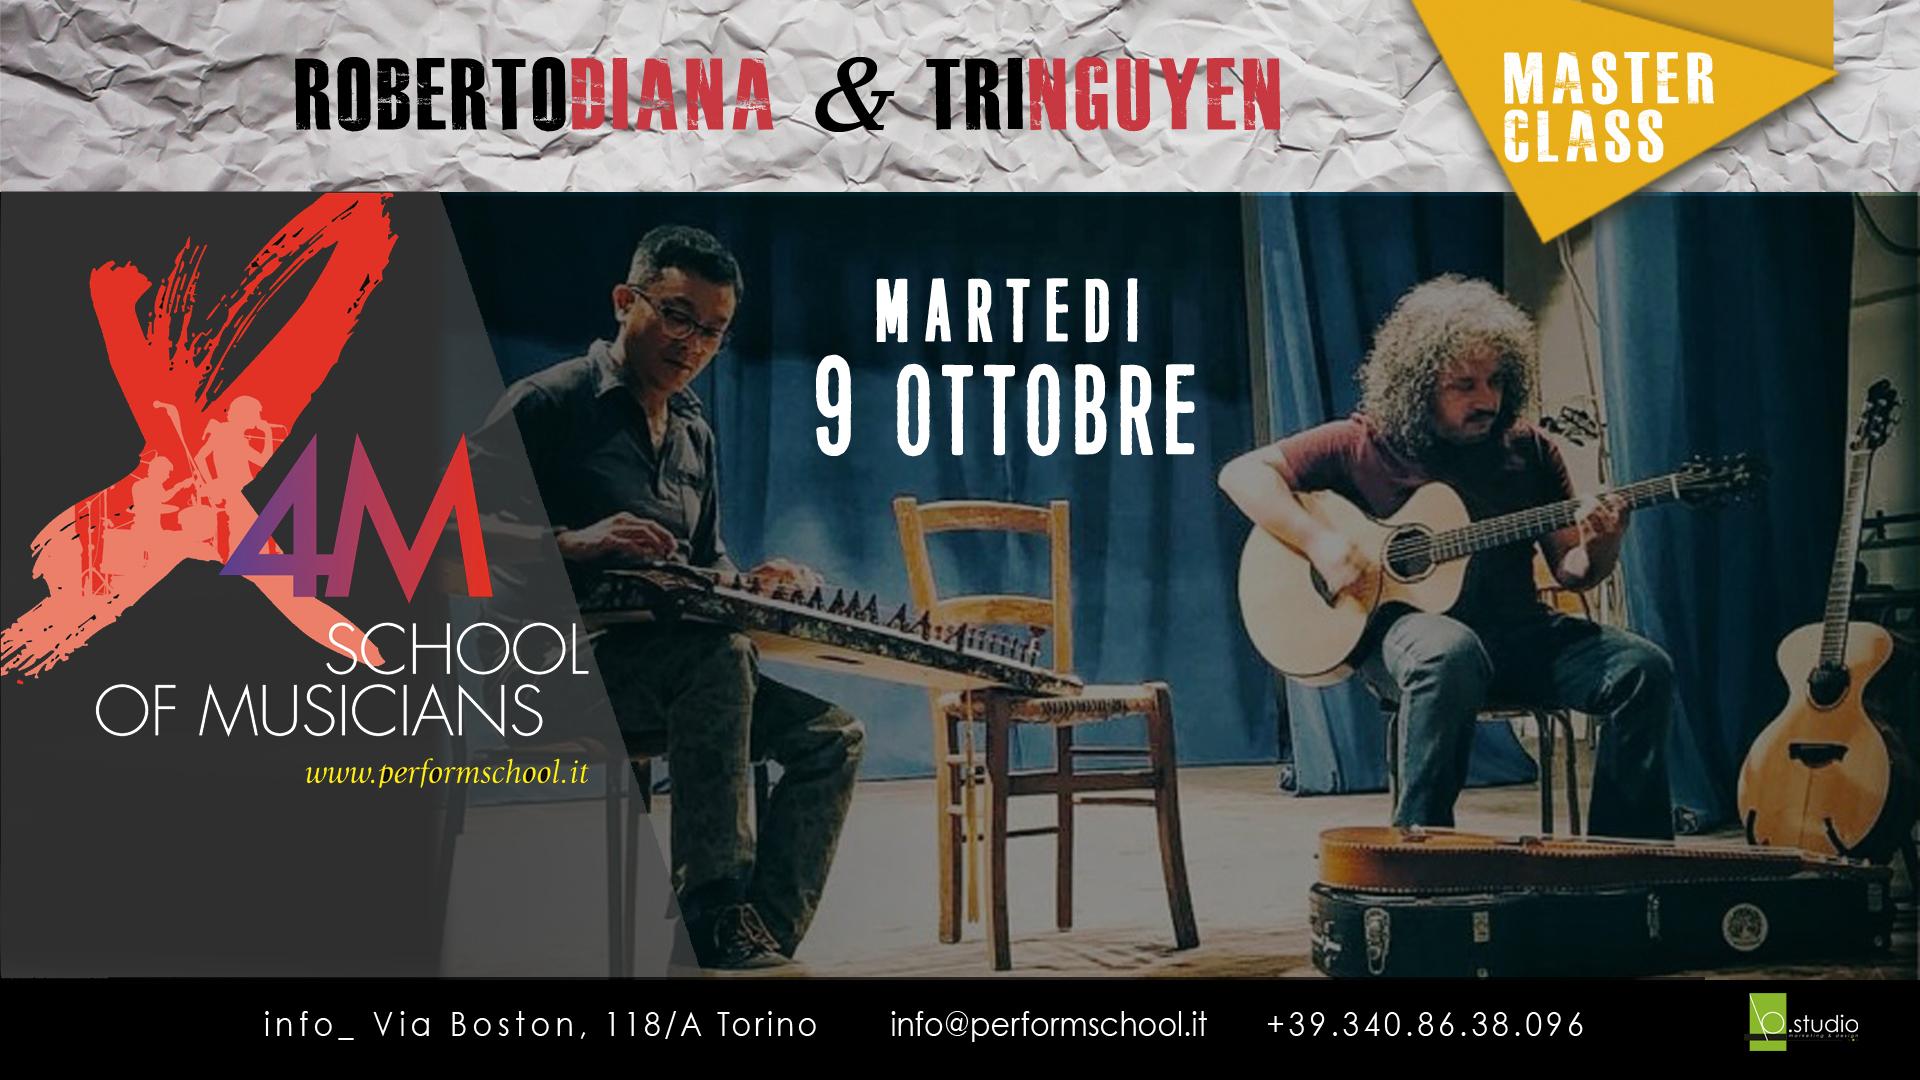 Roberto Diana & Tri Nguyen Workshop Italy Torino Weissenborn and Dan Tranh